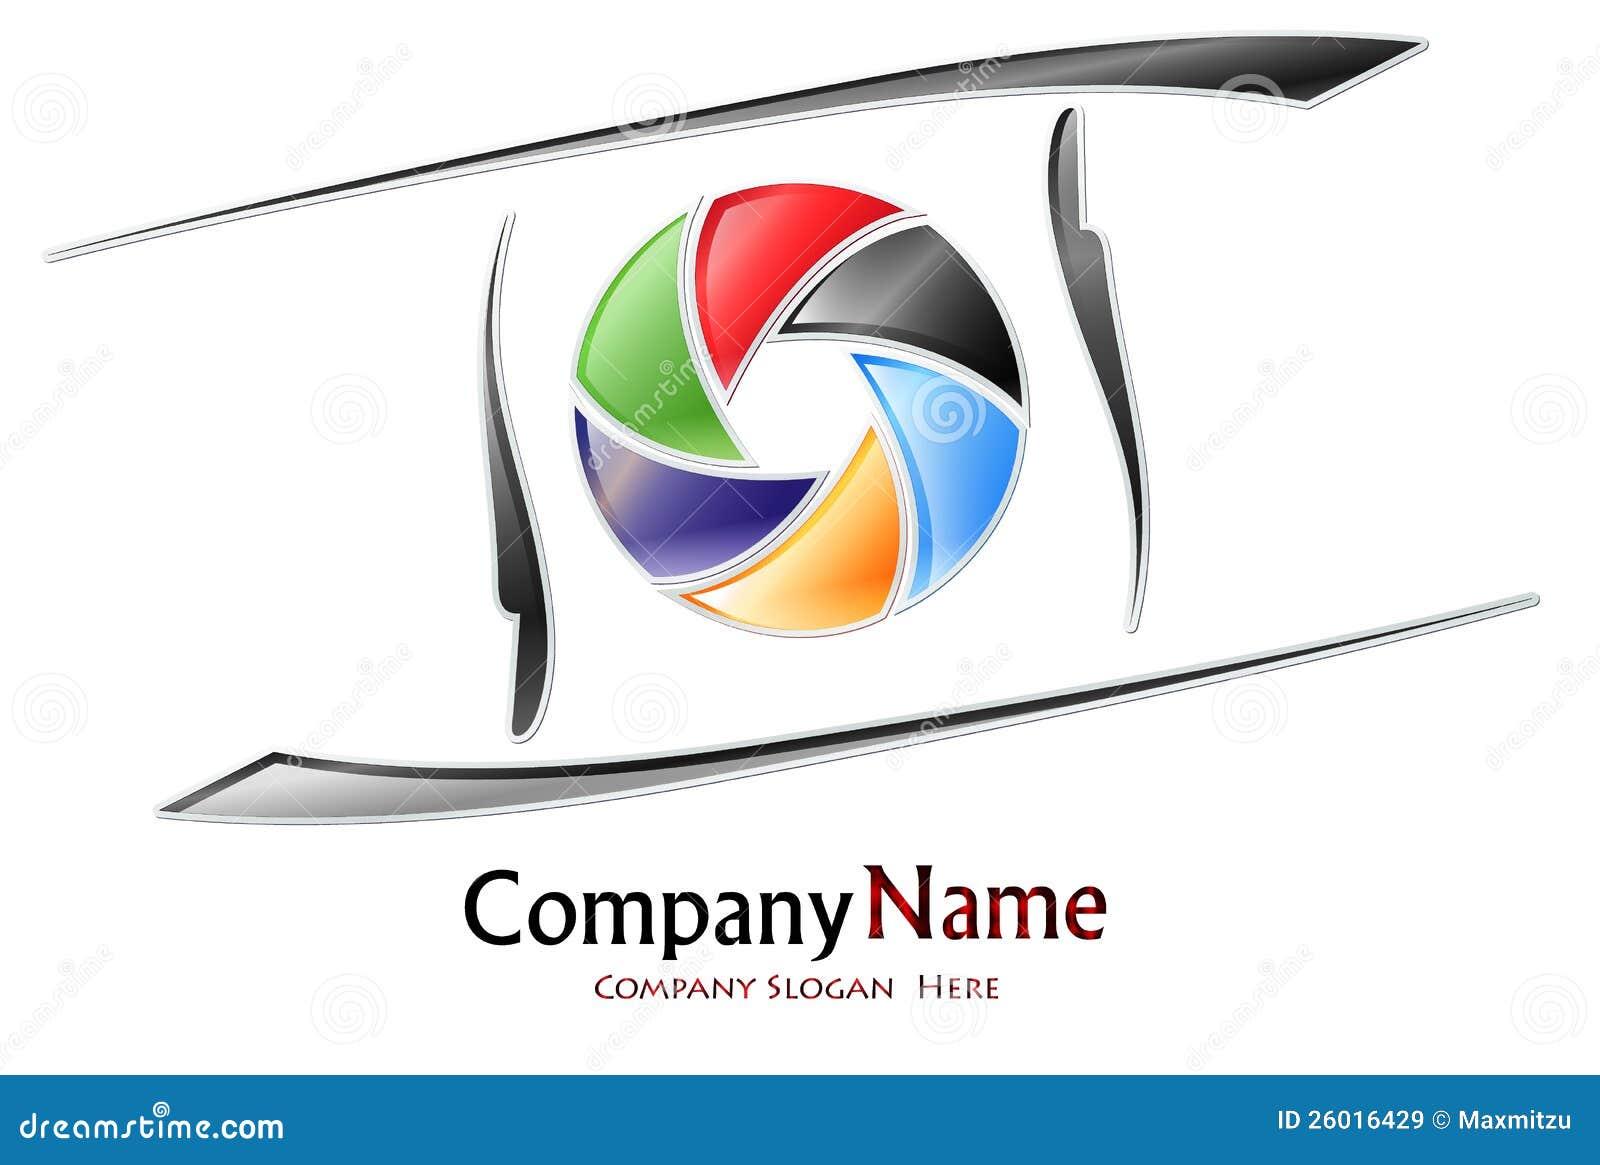 Logo de compagnie de photographie